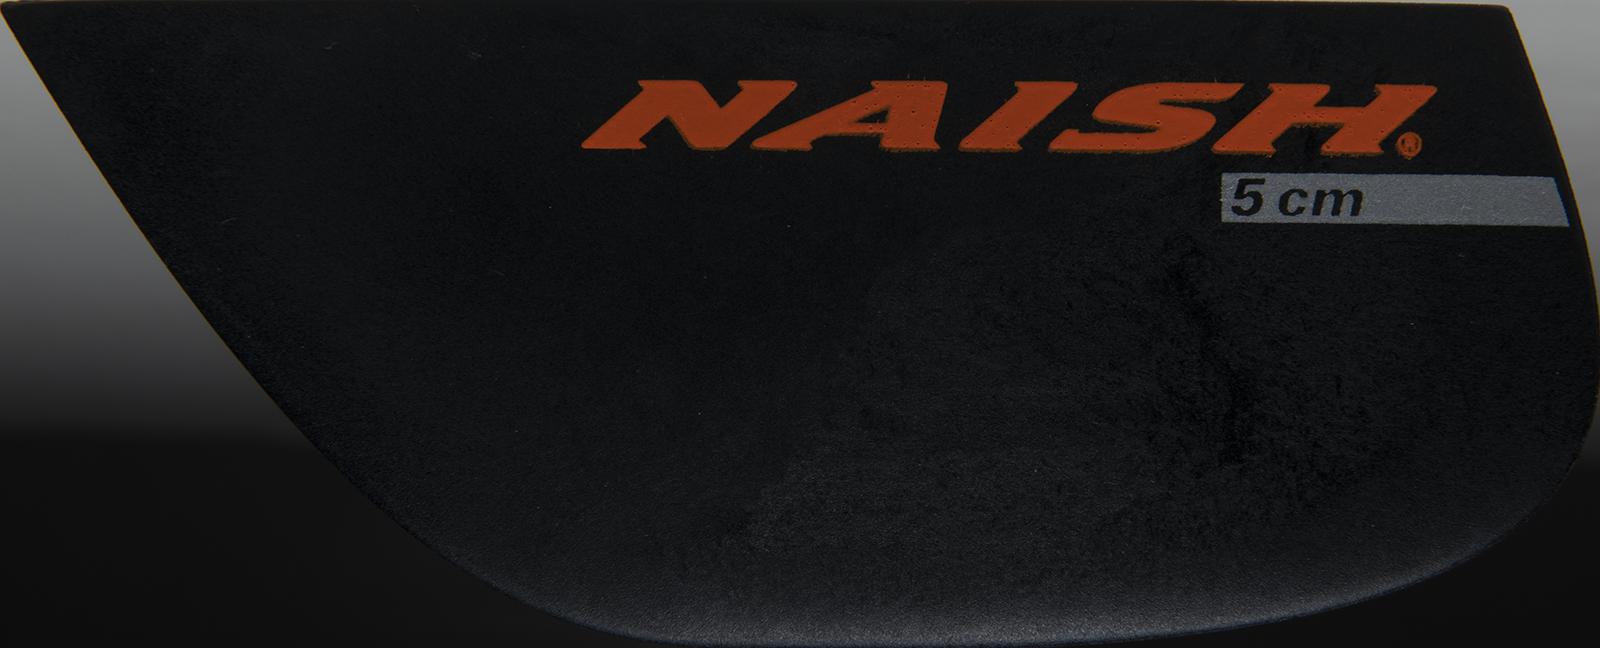 set 4ks ploutvičky Naish 5.0 cm IXEF